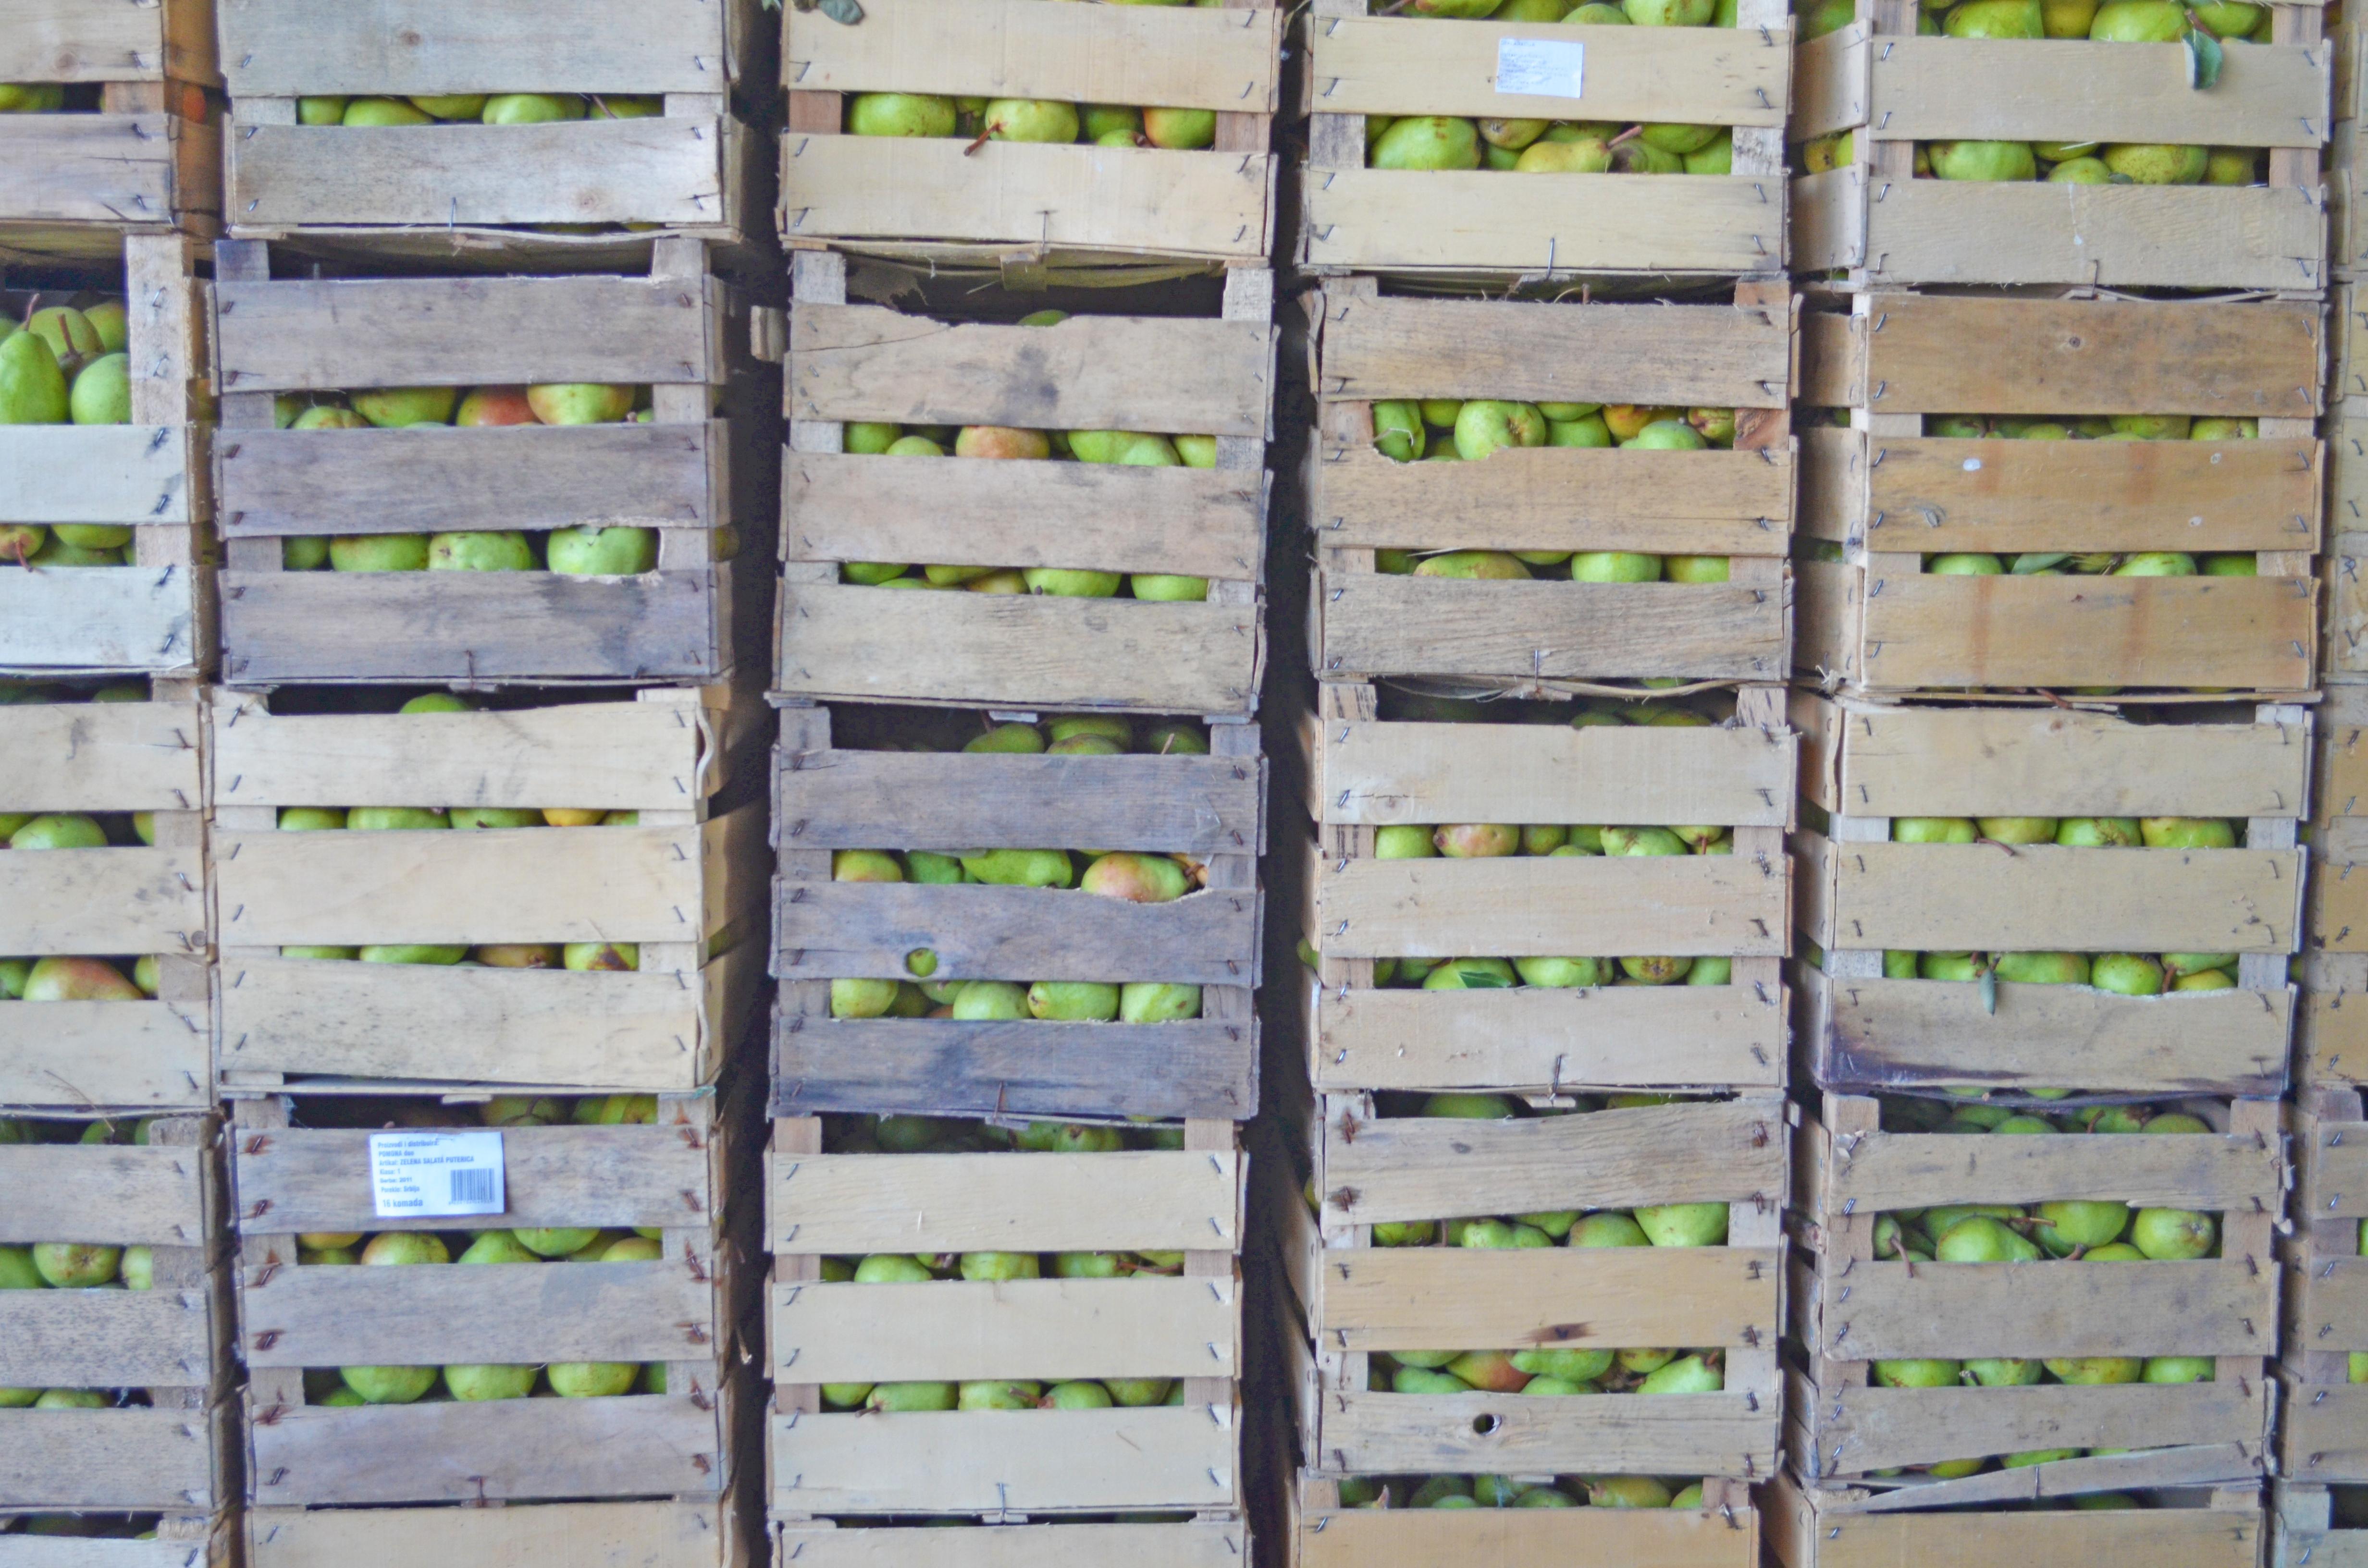 Pears in Crates Klenak